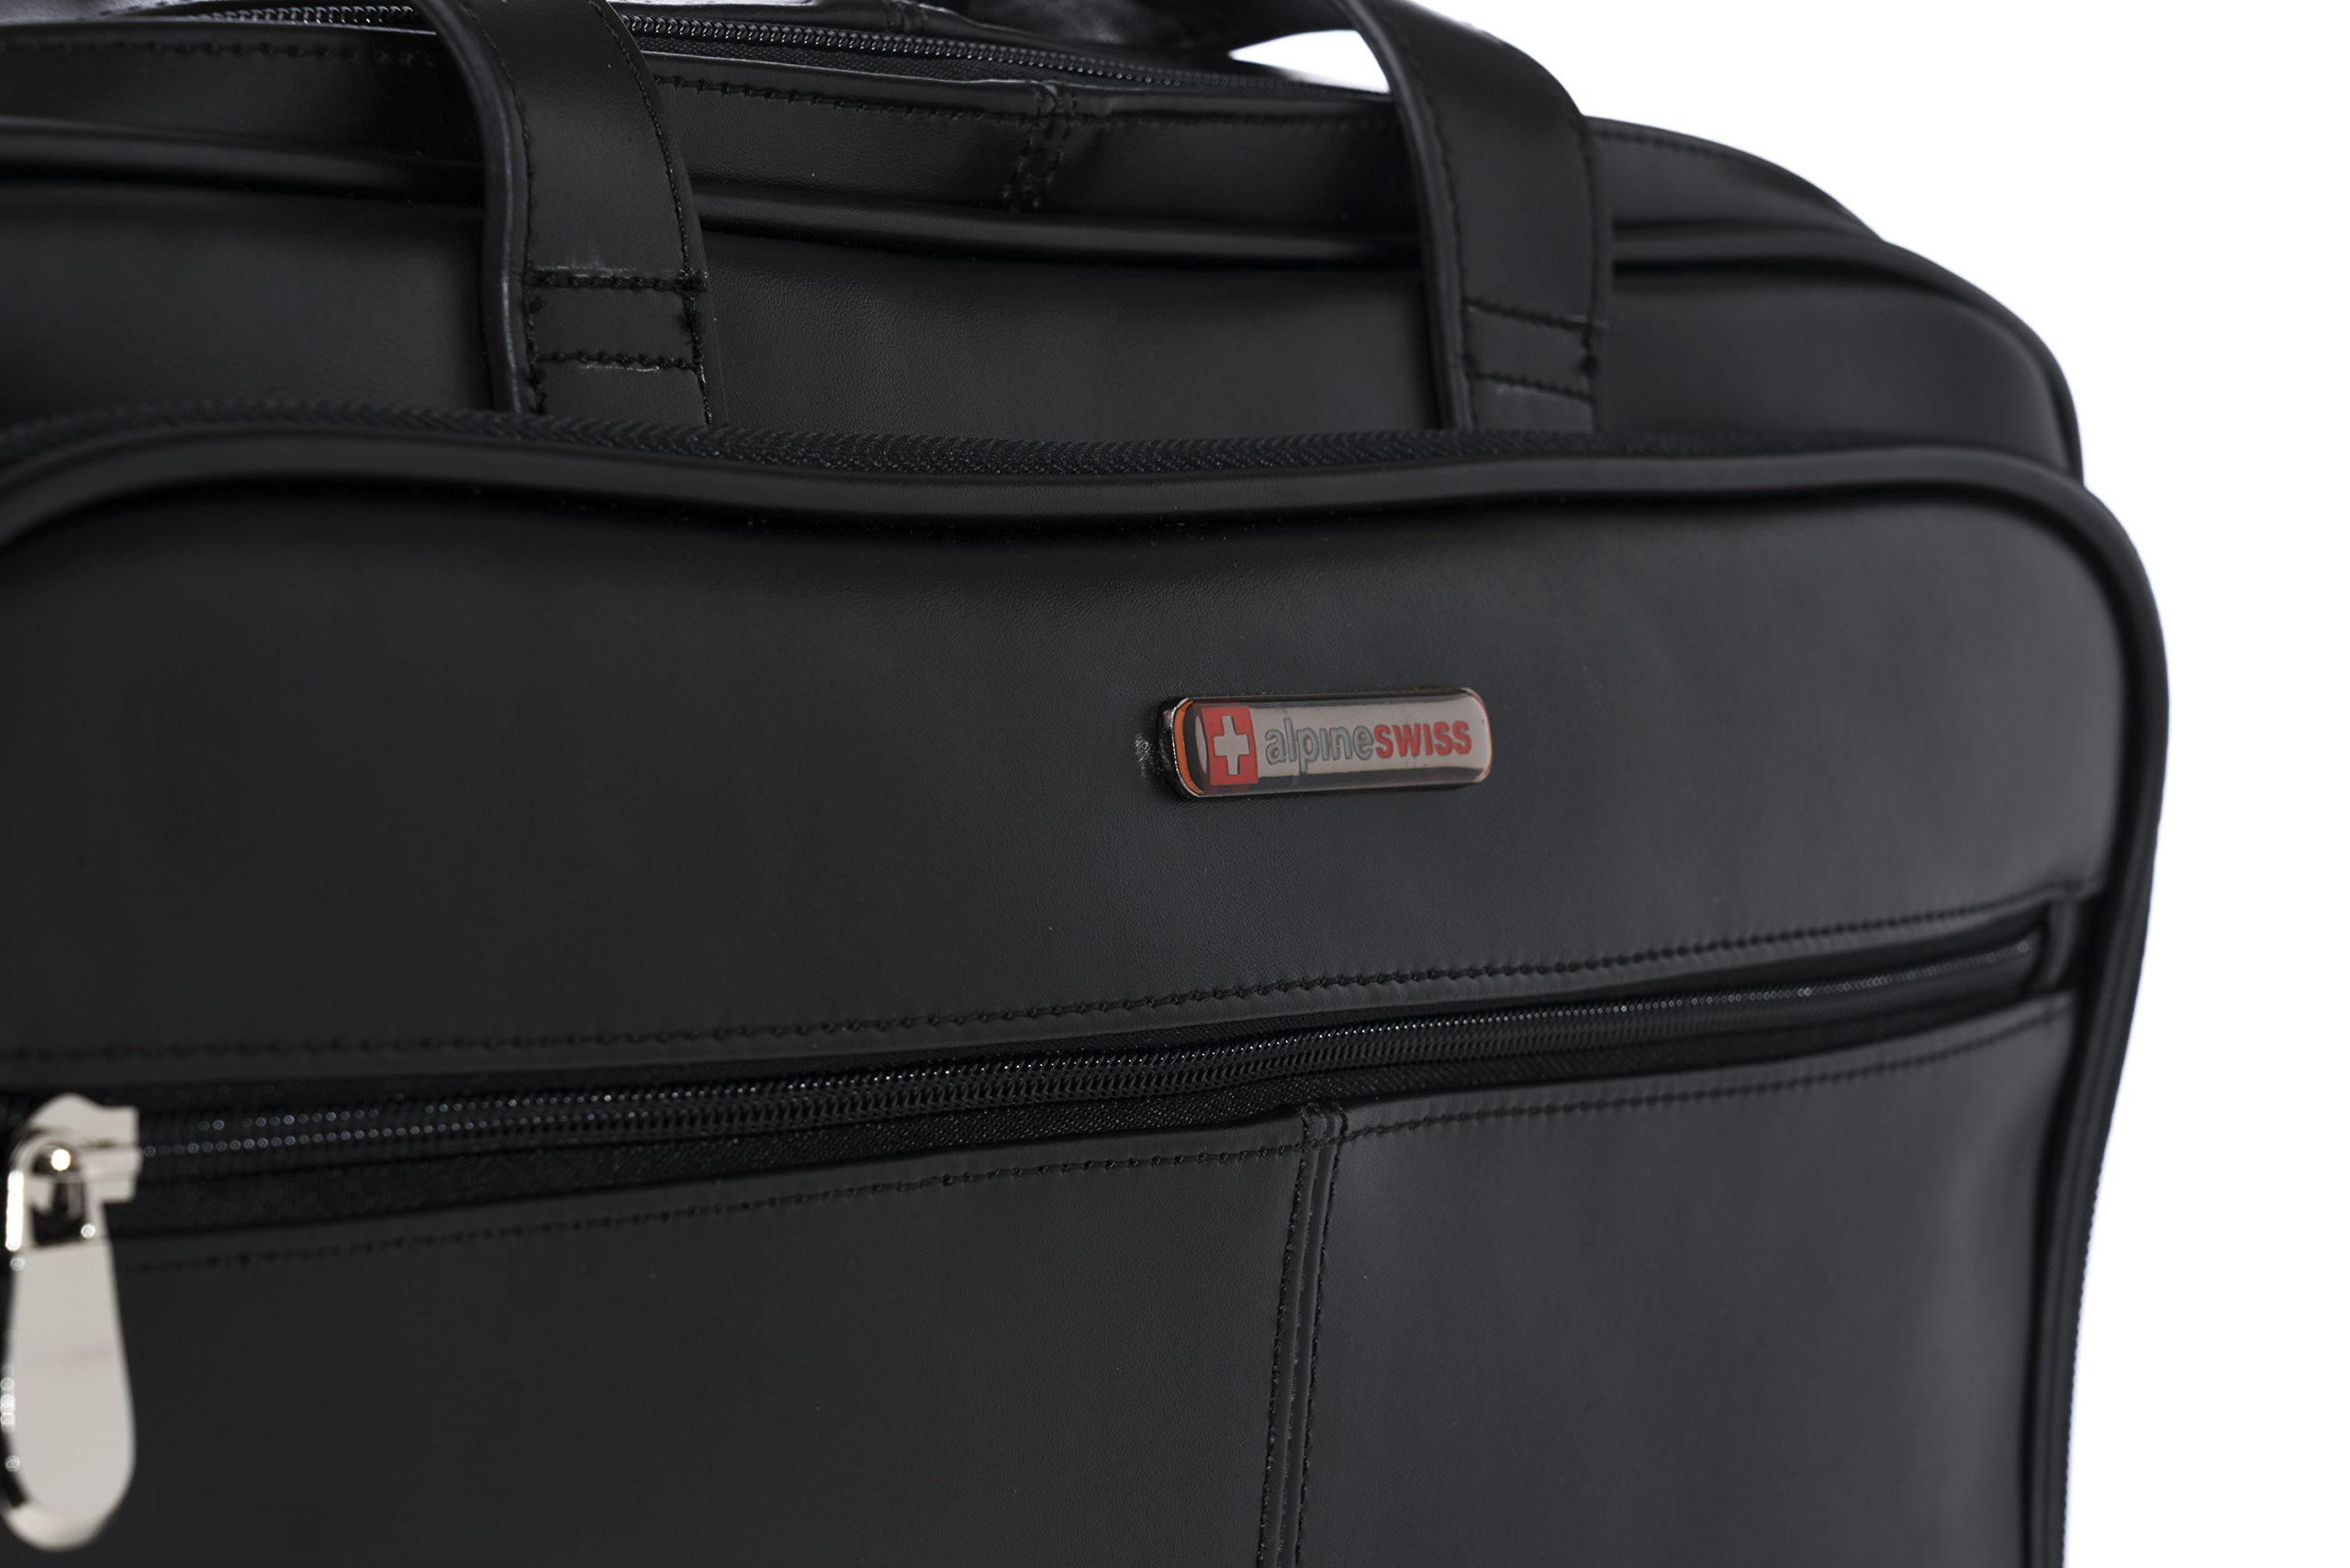 Alpine Swiss Monroe Leather Briefcase Top-Zip Laptop Messenger Bag Black by alpine swiss (Image #8)